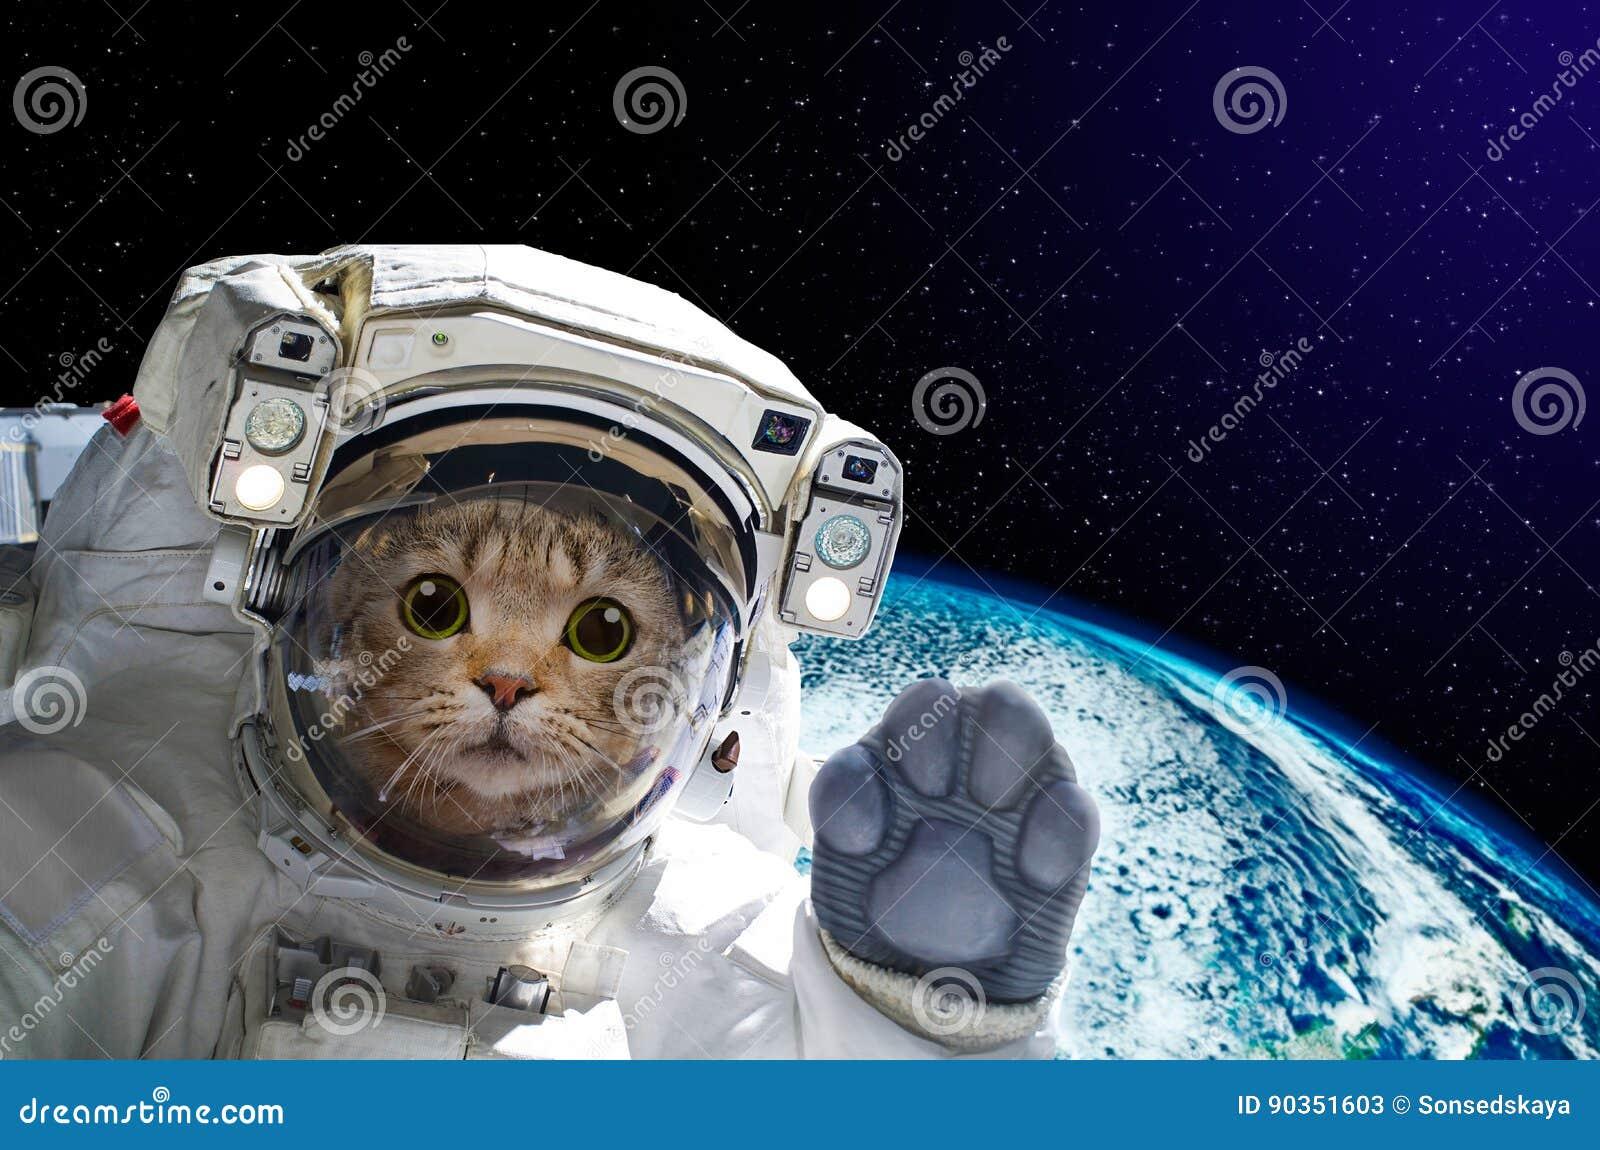 astronaut in the spacecraft - photo #46